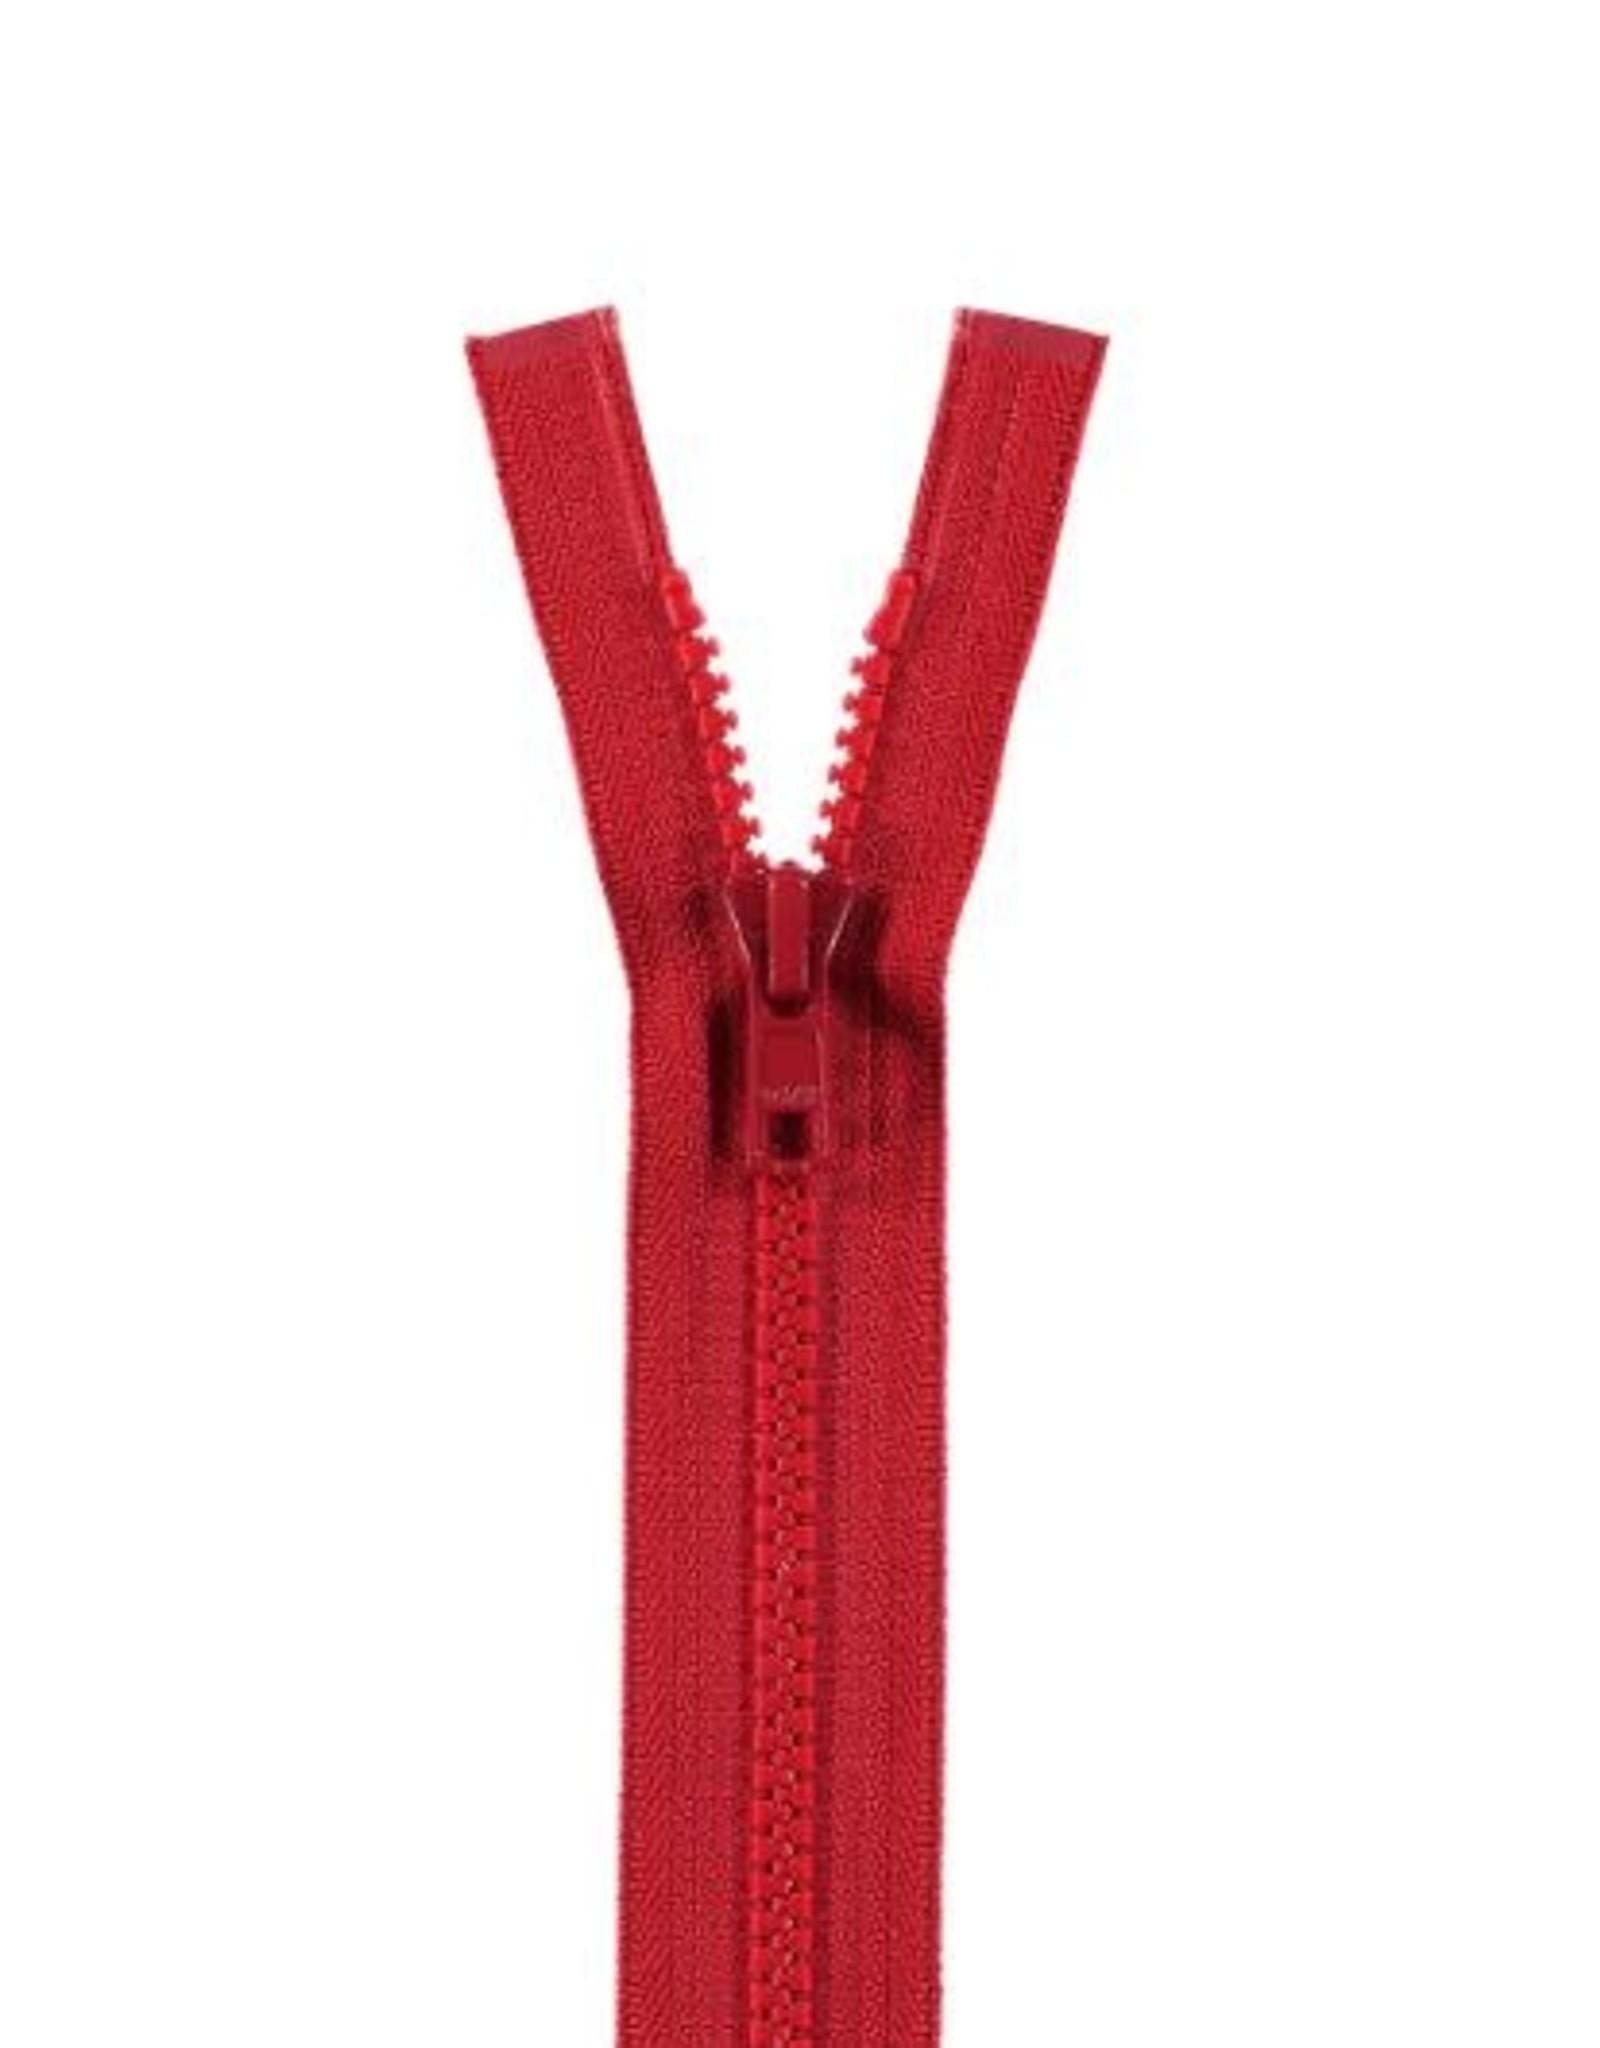 YKK BLOKRITS 5 DEELBAAR rood 519-55cm